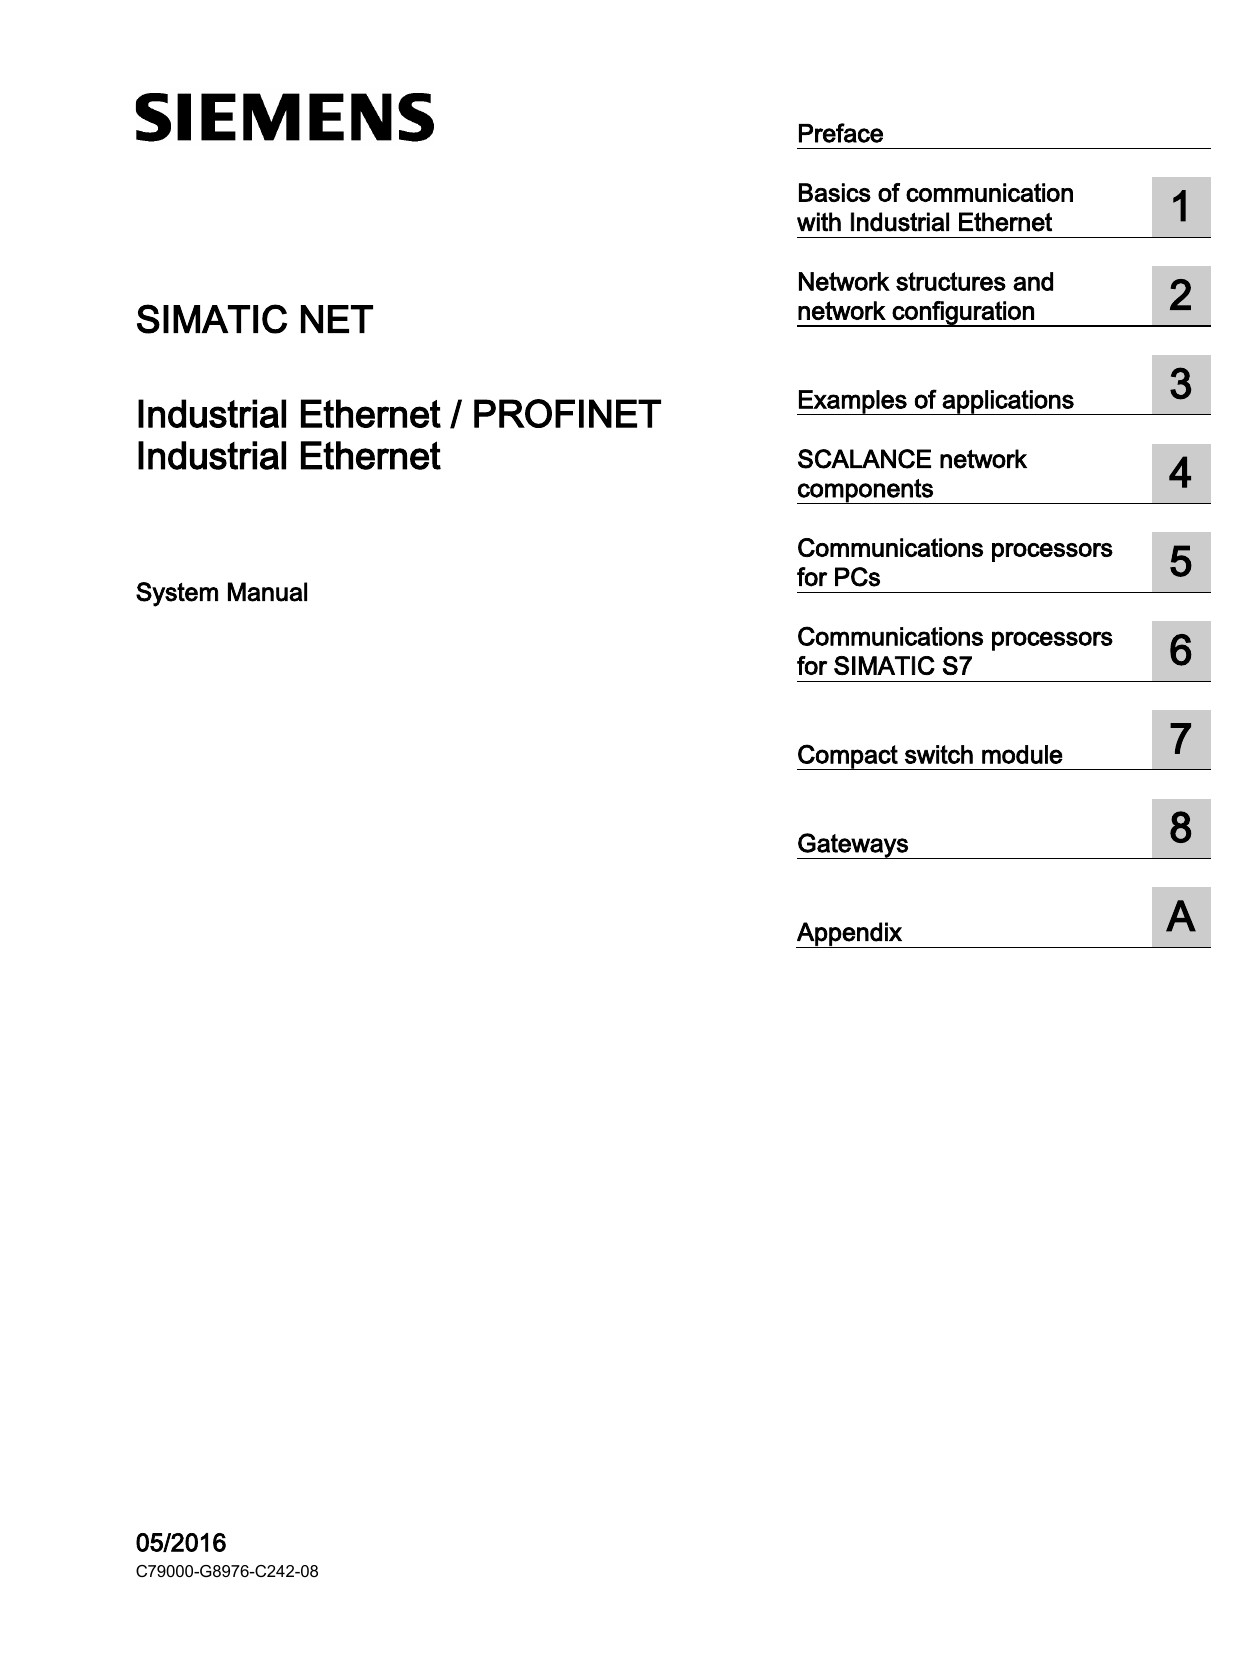 Samsung Dv45h7000ew/a2 Wiring Diagram Industrial Ethernet Industry Support Siemens Of Samsung Dv45h7000ew/a2 Wiring Diagram